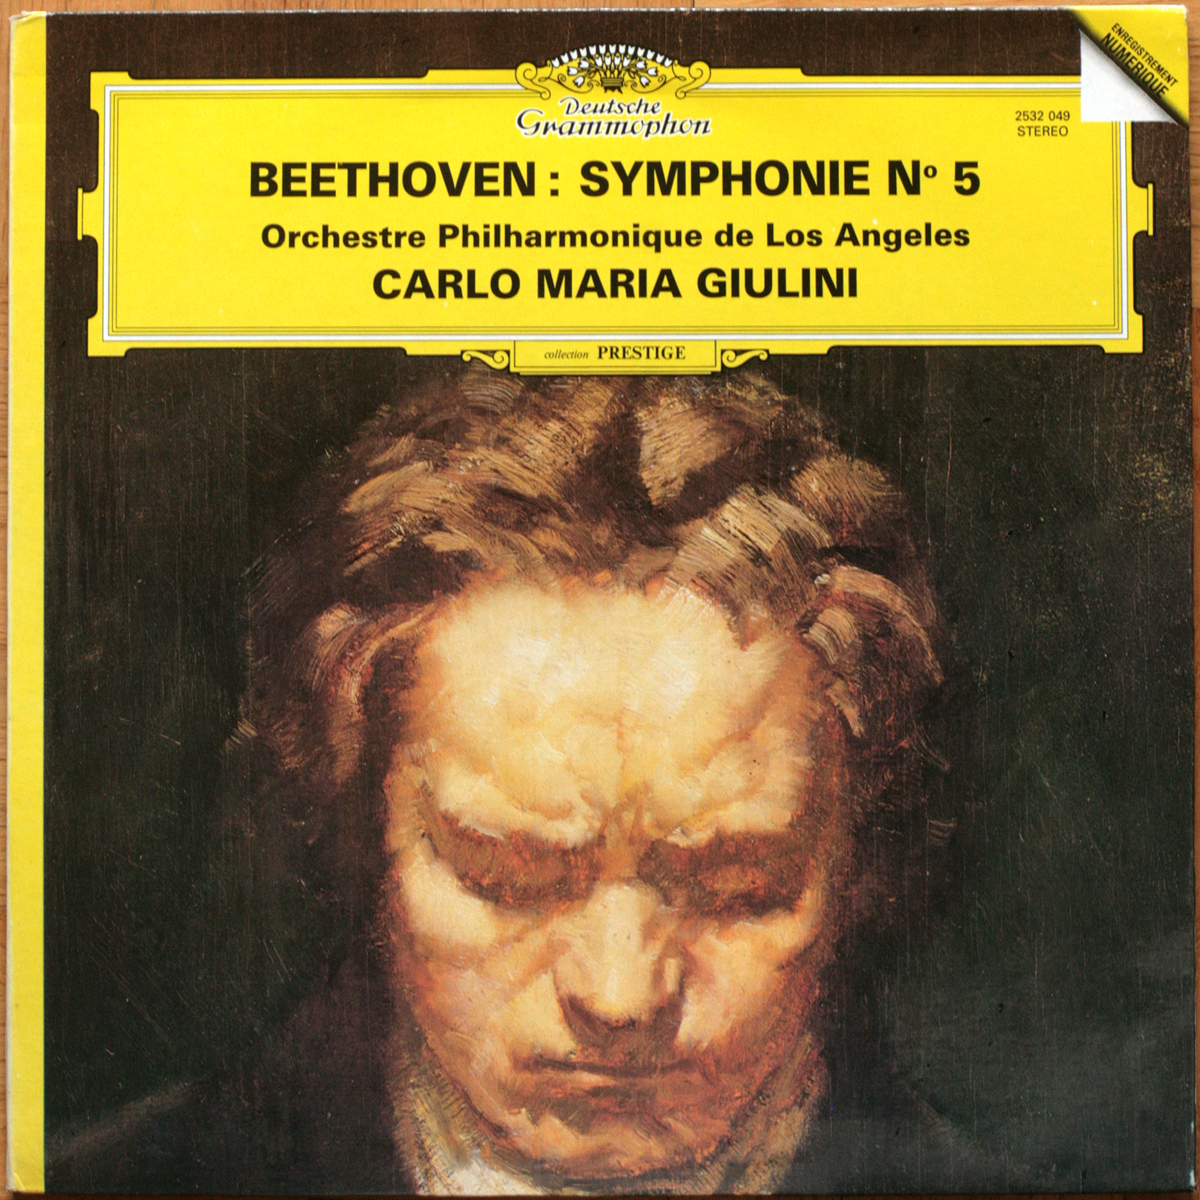 DGG 2532049 Beethoven Symphonie 5 Giulini